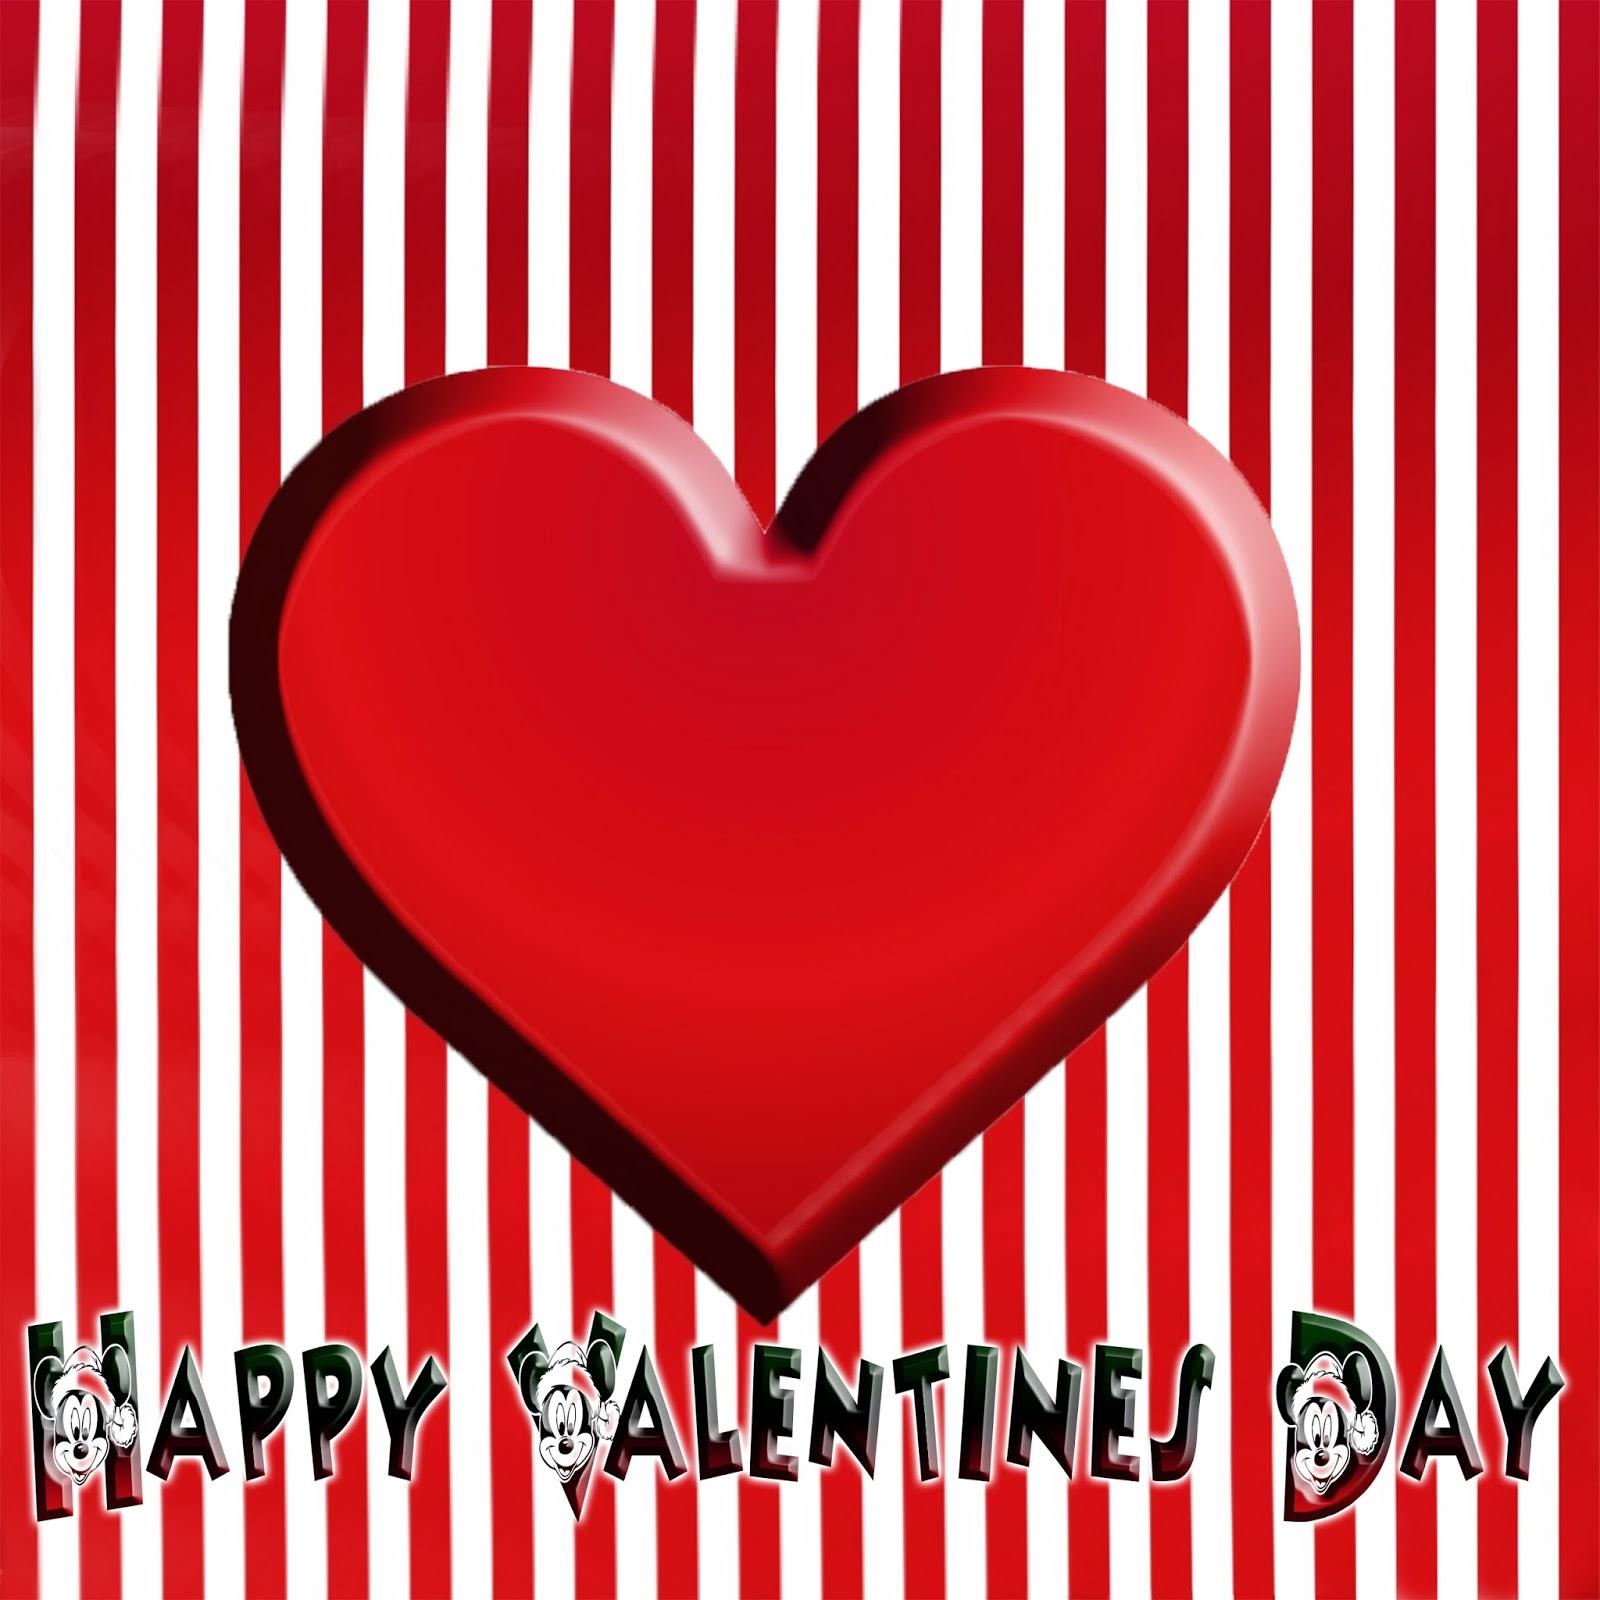 Happy-Walentines-Day-Heart-Walpaper-Image-HD-Wide